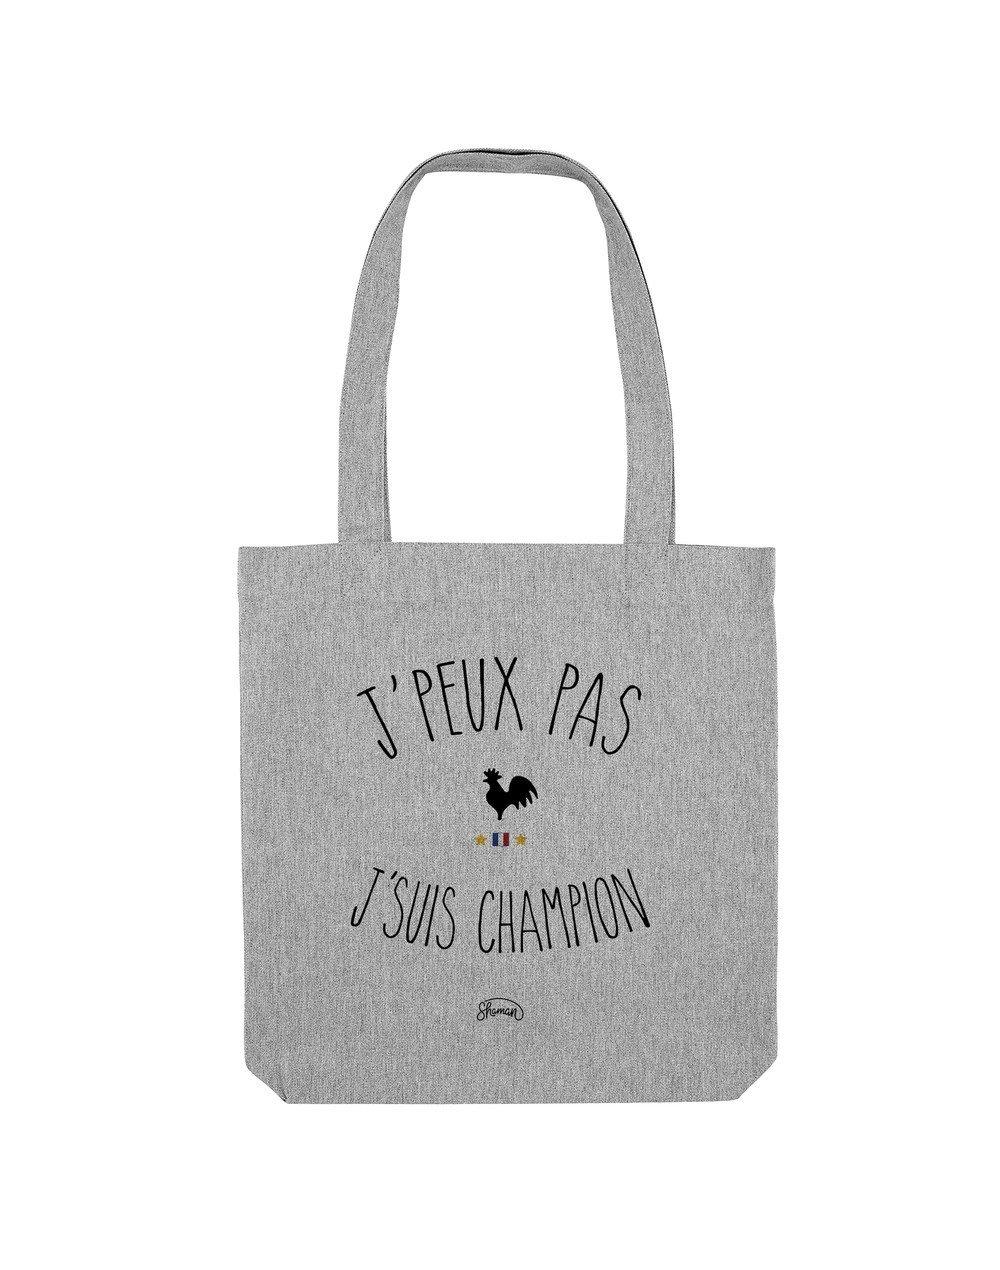 "Tote Bag ""J'peux pas champion"""